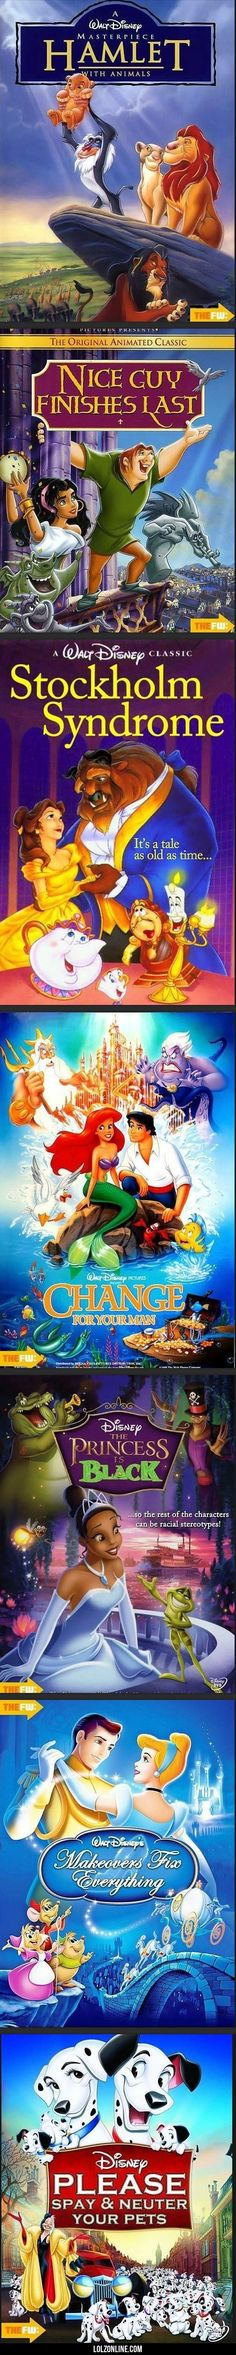 Brutally Honest Disney Posters#funny #lol #lolzonline